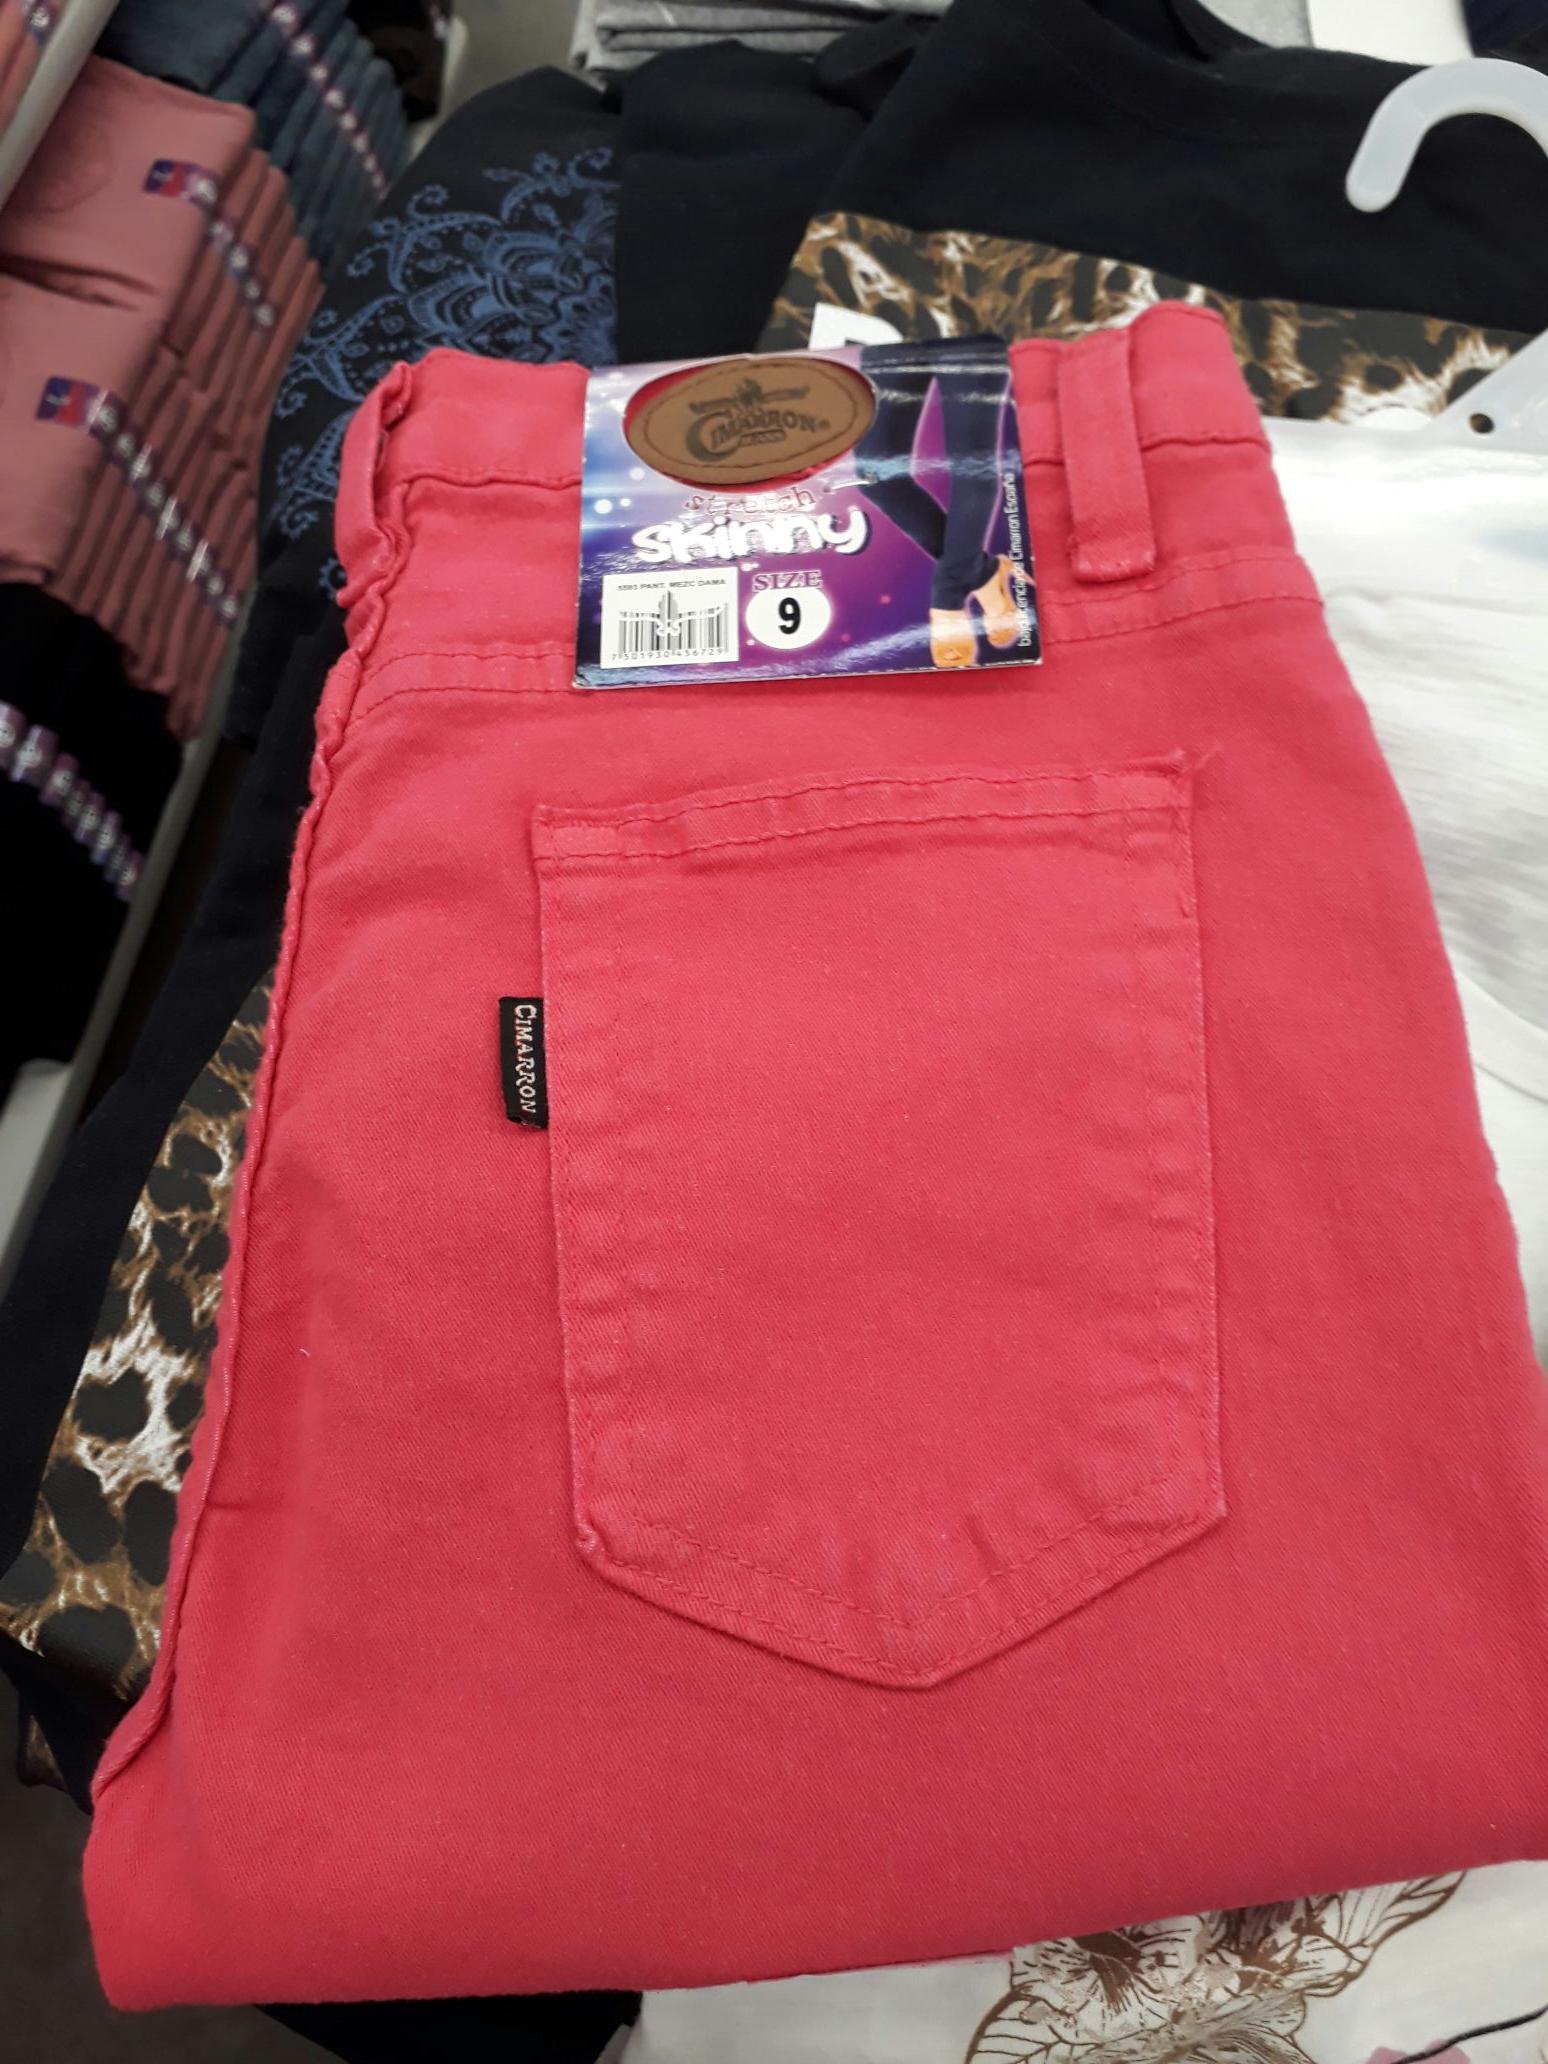 Bodega aurrera: pantalon cimarron